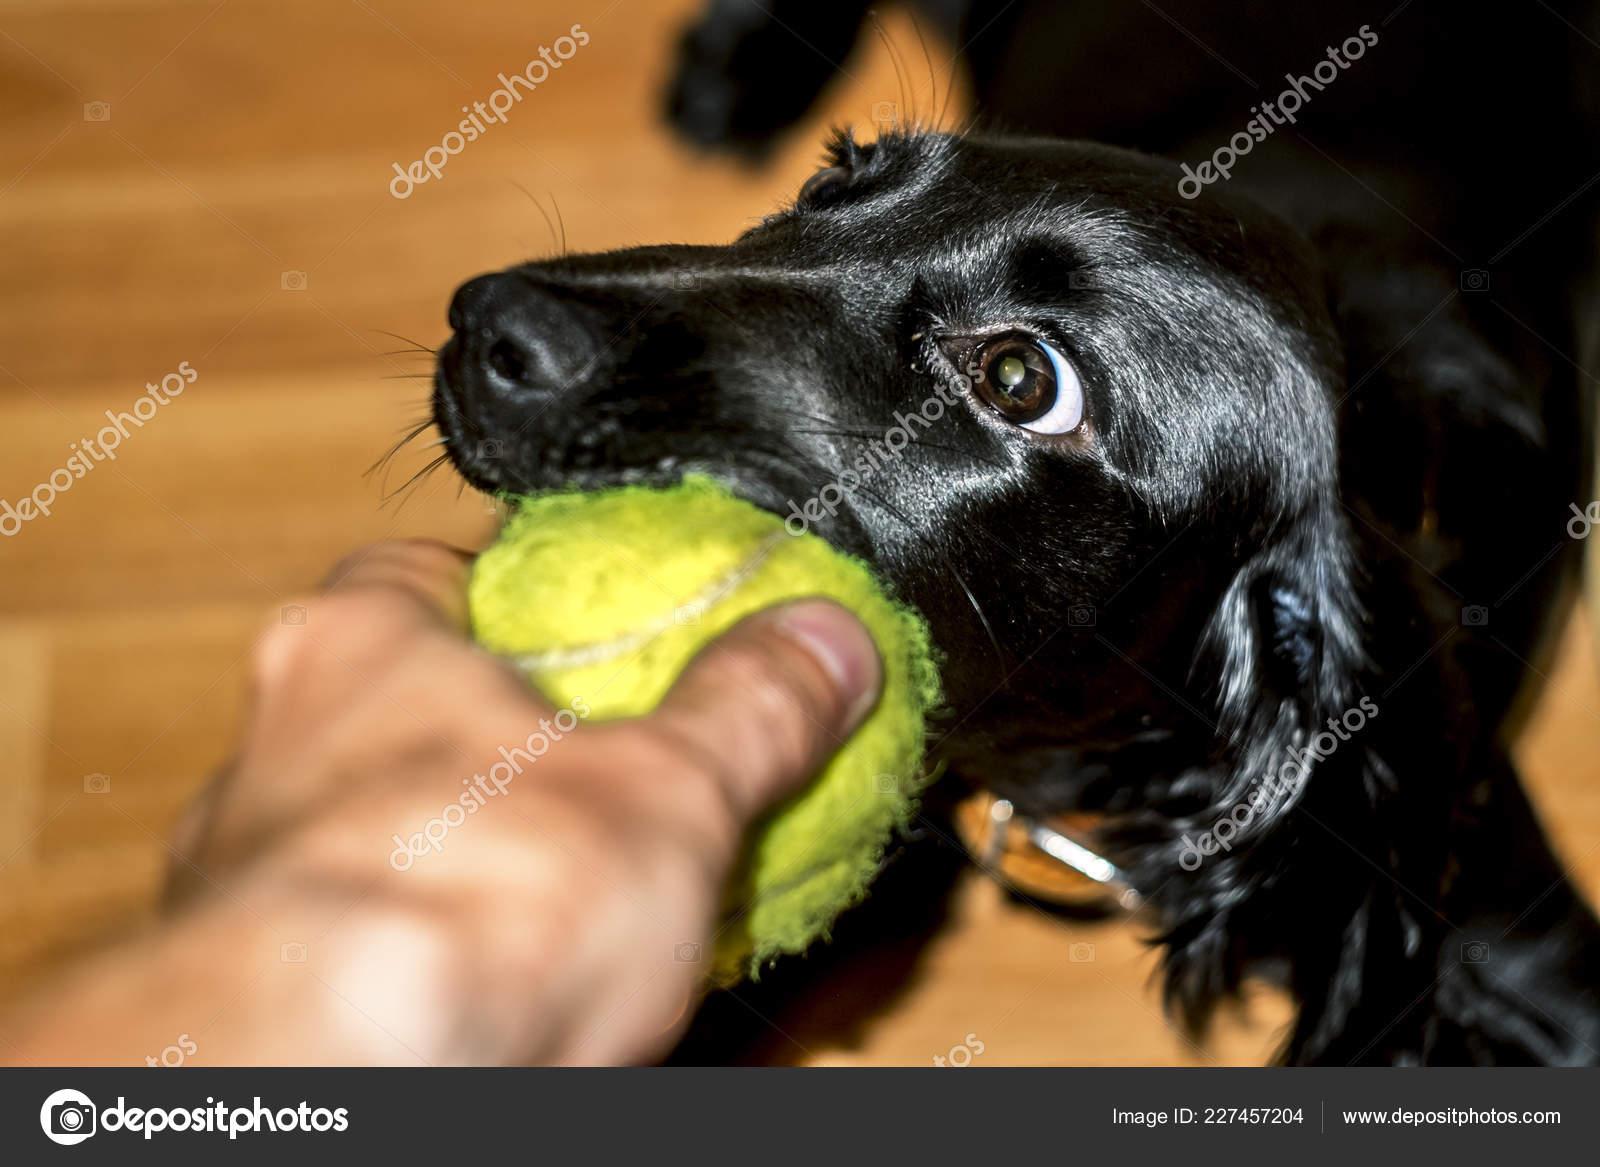 Cute Black Cocker Spaniel Puppy Playing Tennis Ball Stock Photo C Toshket 227457204